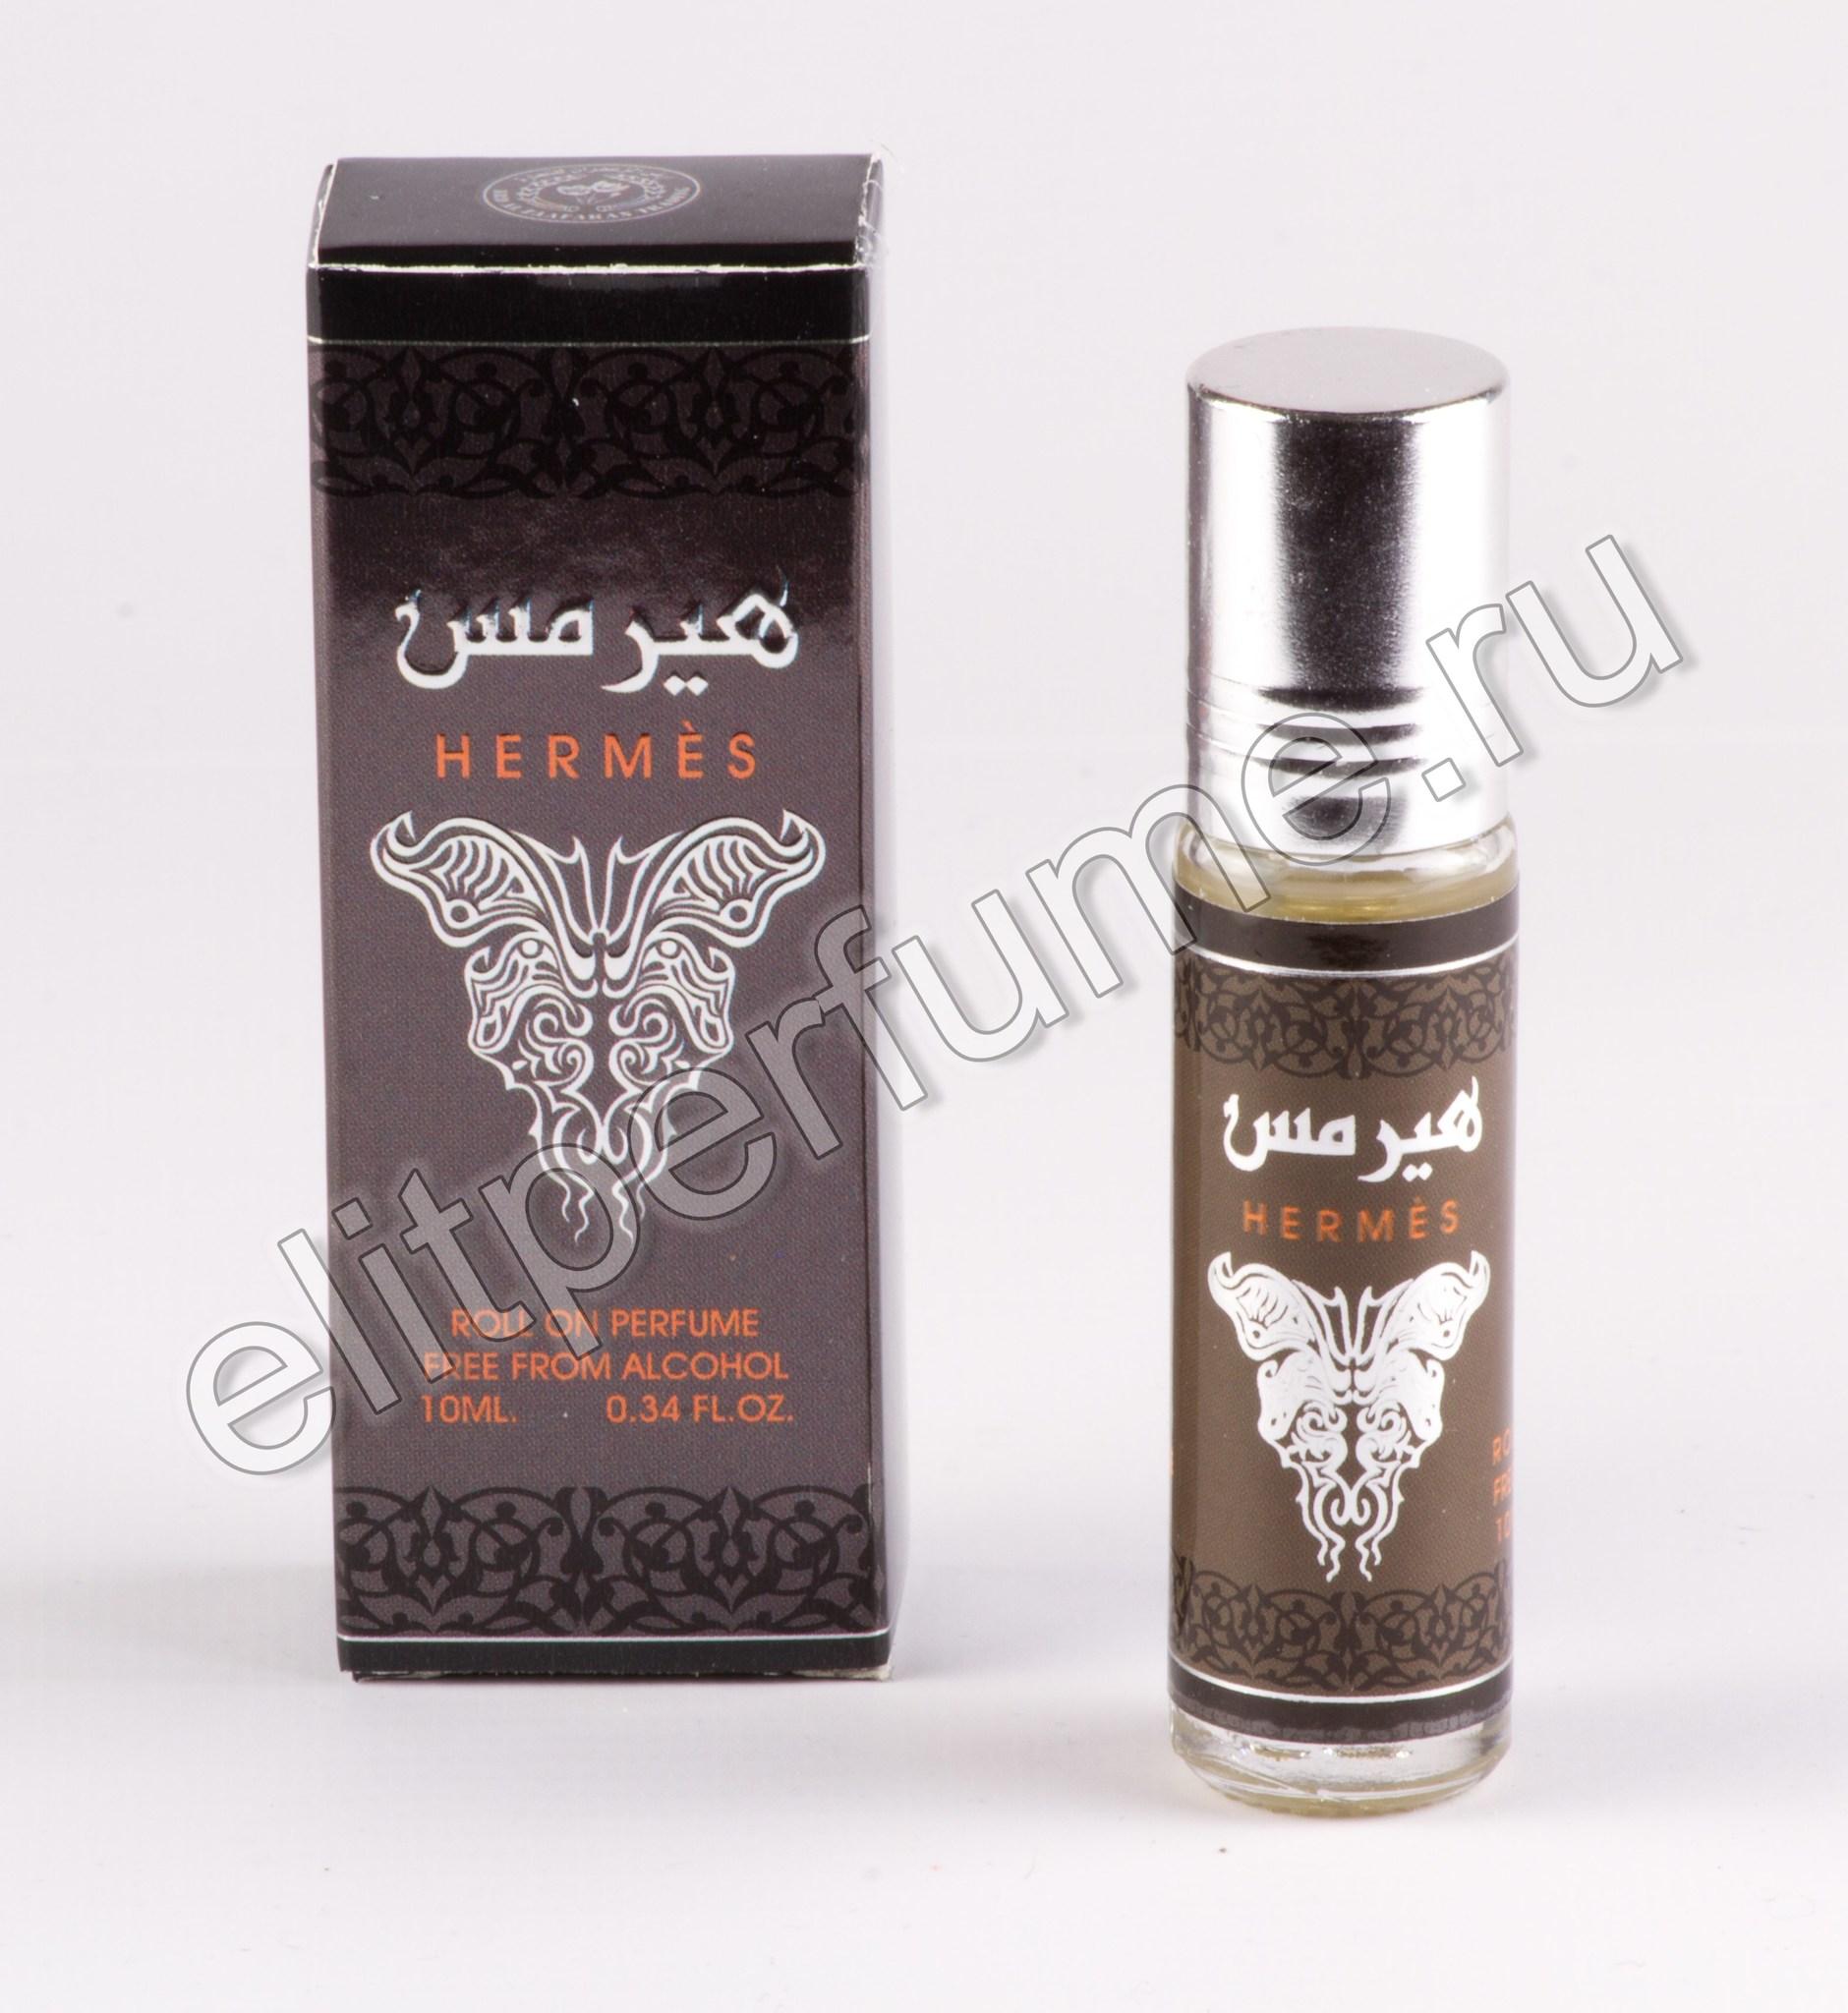 Hermes Гермес 10 ml арабские масляные духи от Ард Аль Заафаран Ard Al Zaafaran